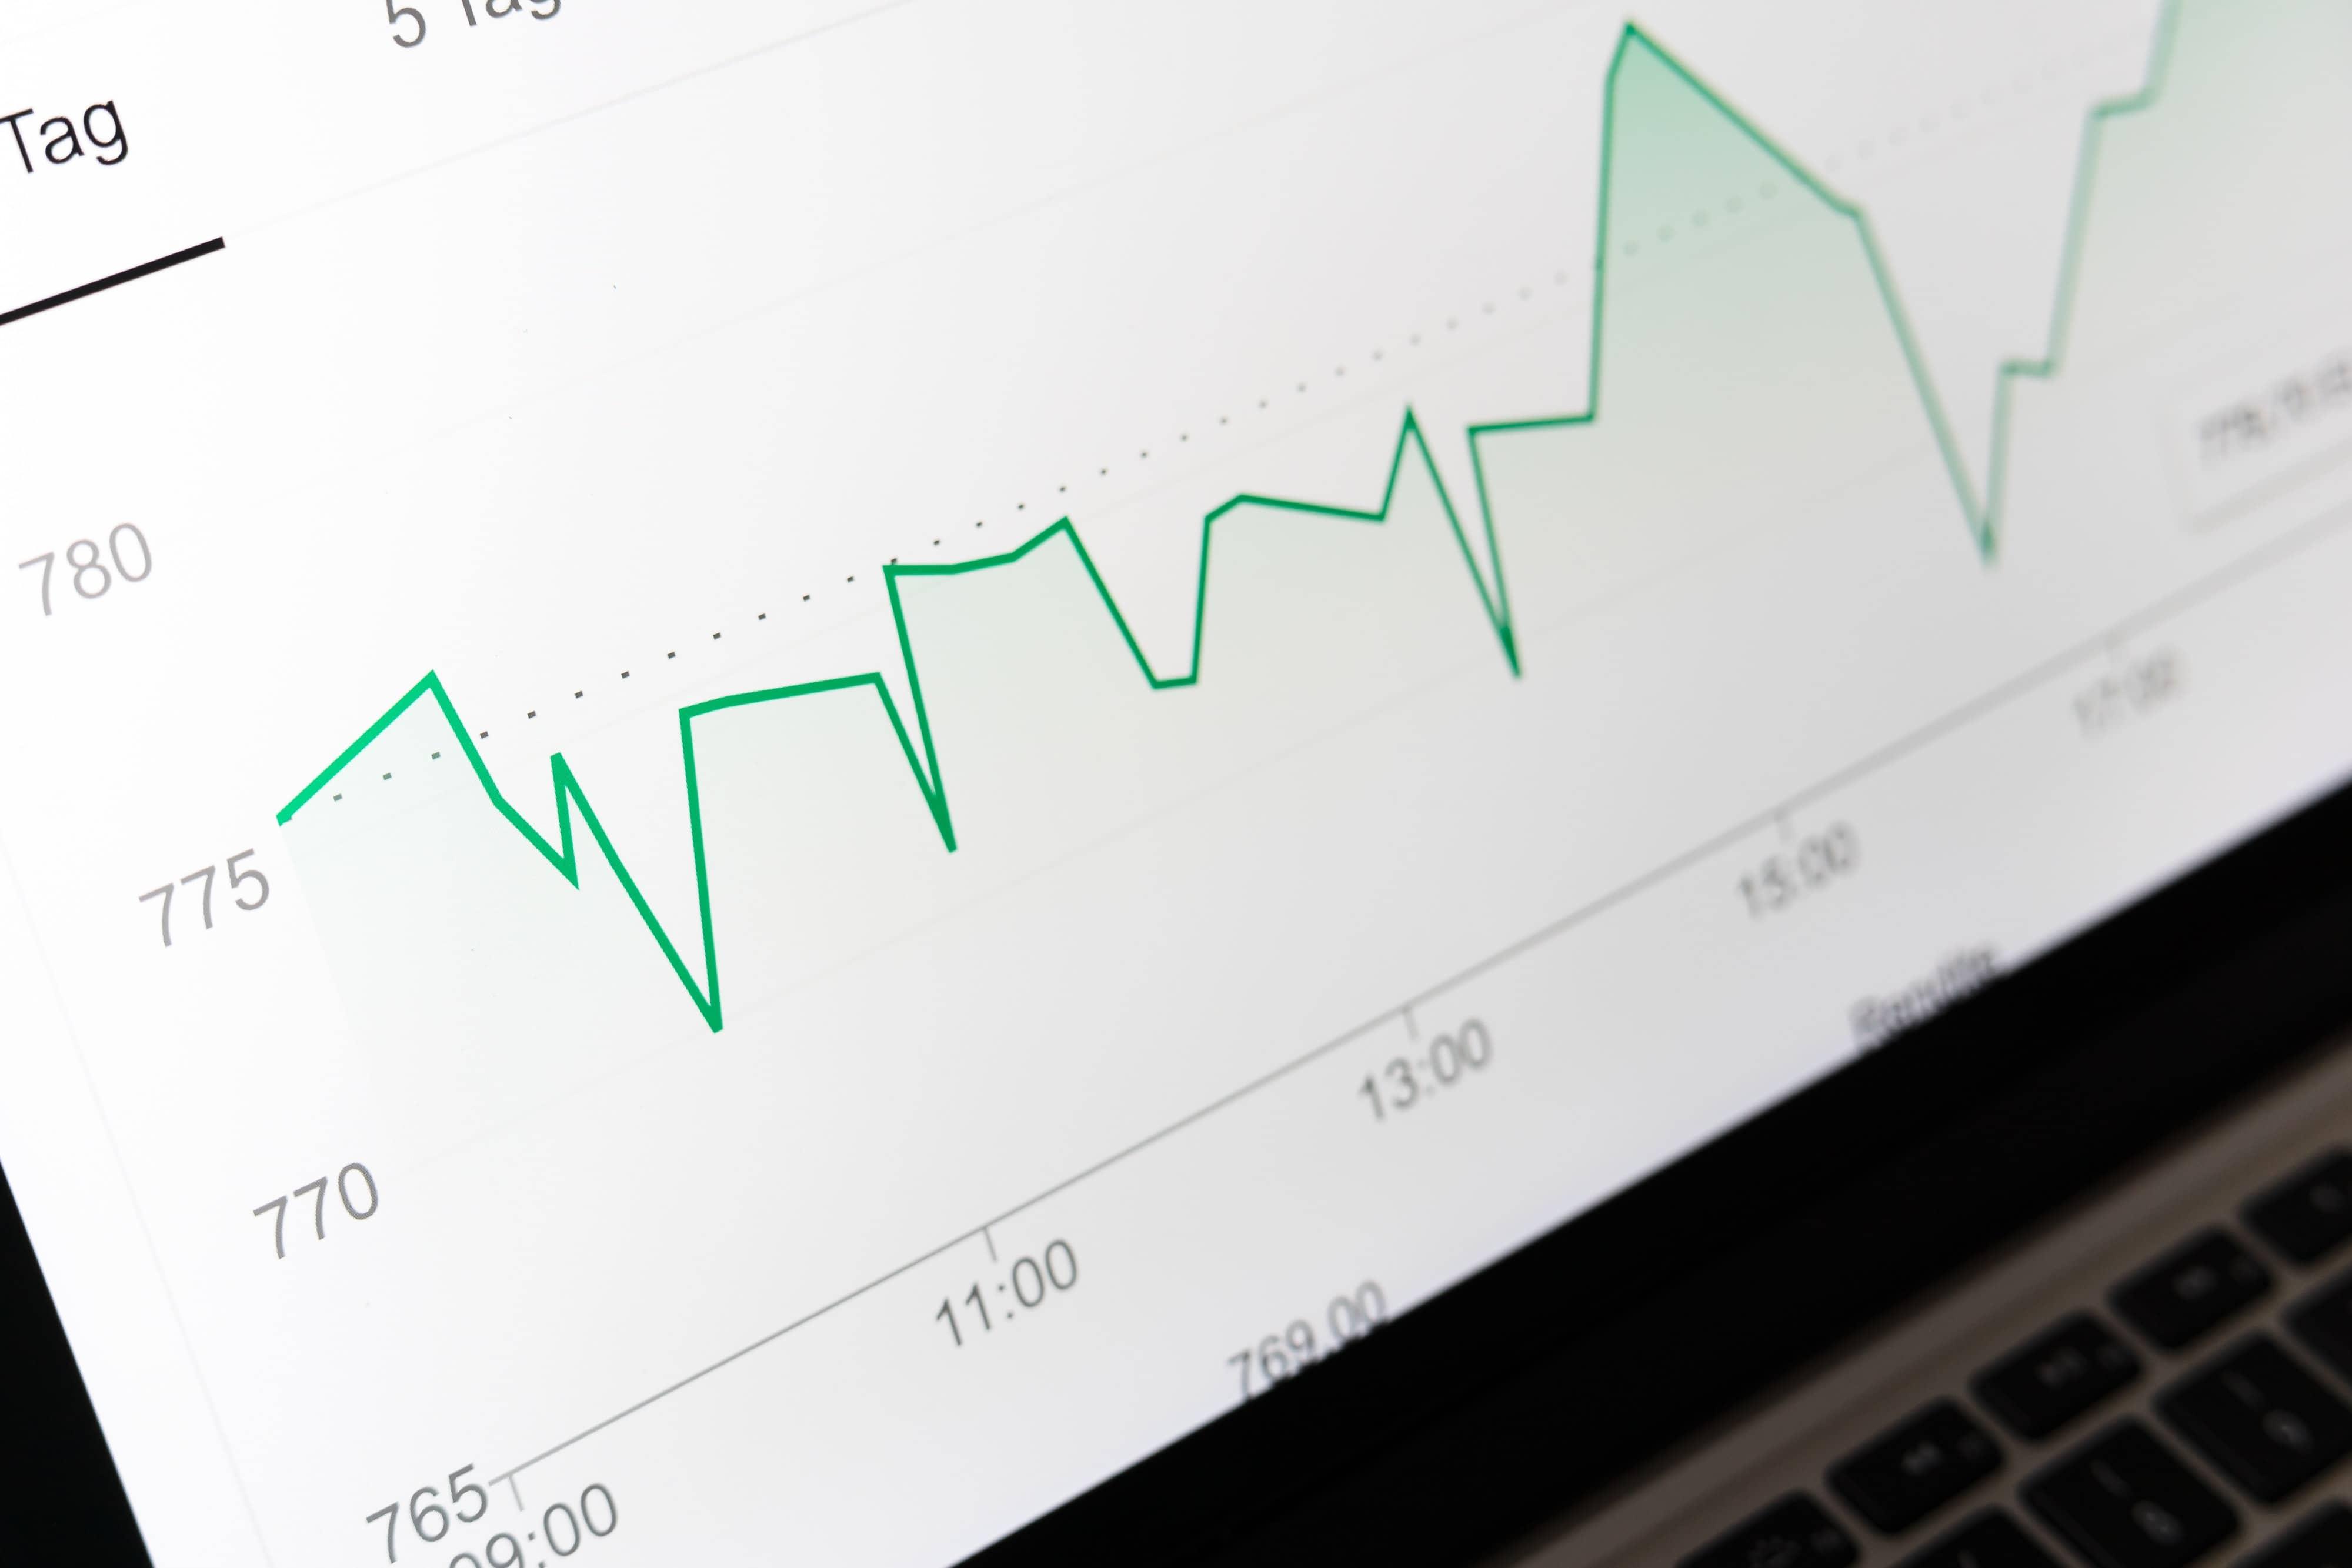 Online stock portfolio analysis for private customers